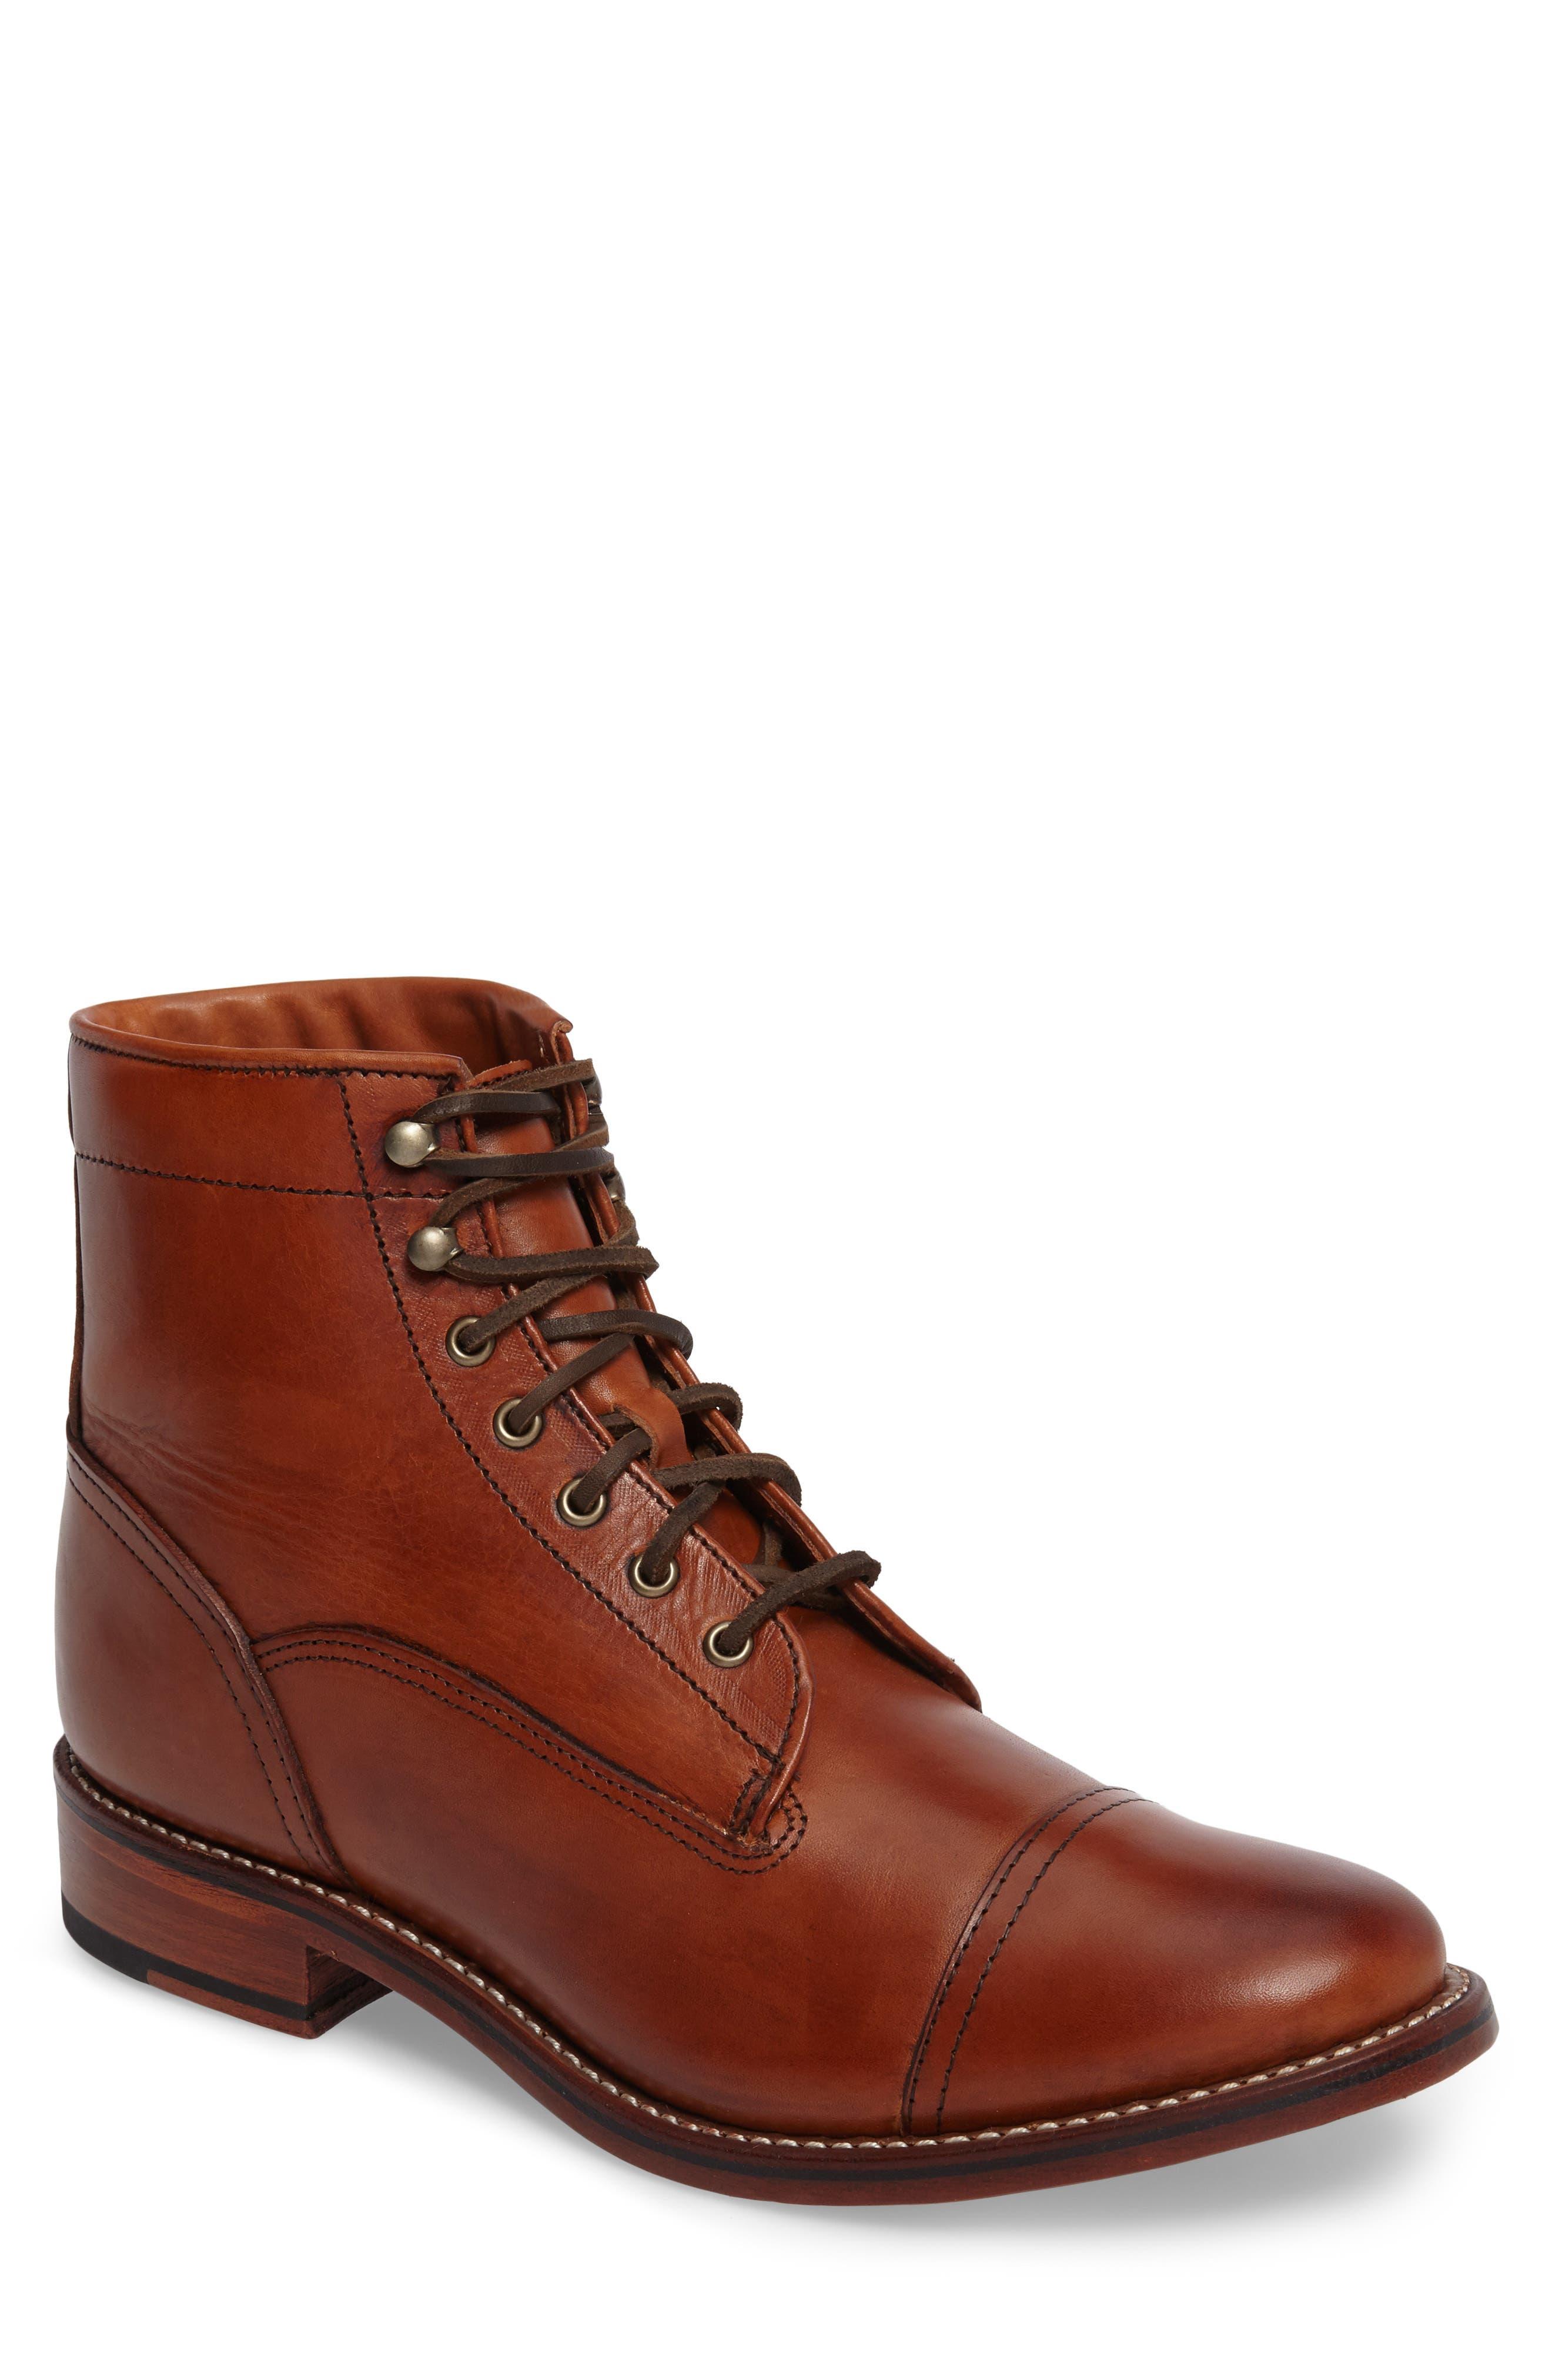 Main Image - Ariat Highlands Cap Toe Boot (Men)